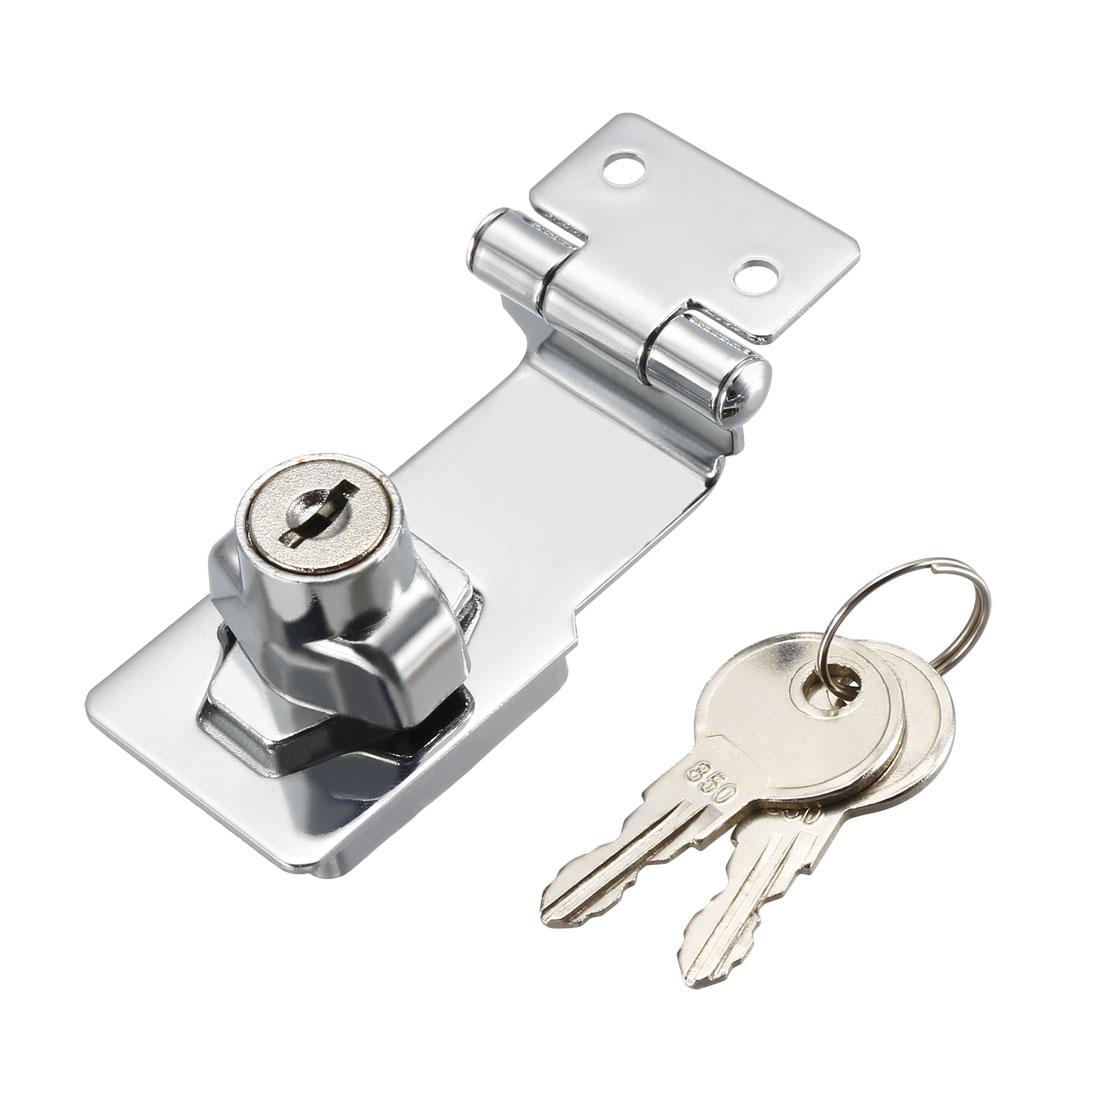 Keyed Hasp Lock 68mm Twist Knob Keyed Locking Hasp for Door Cabinet